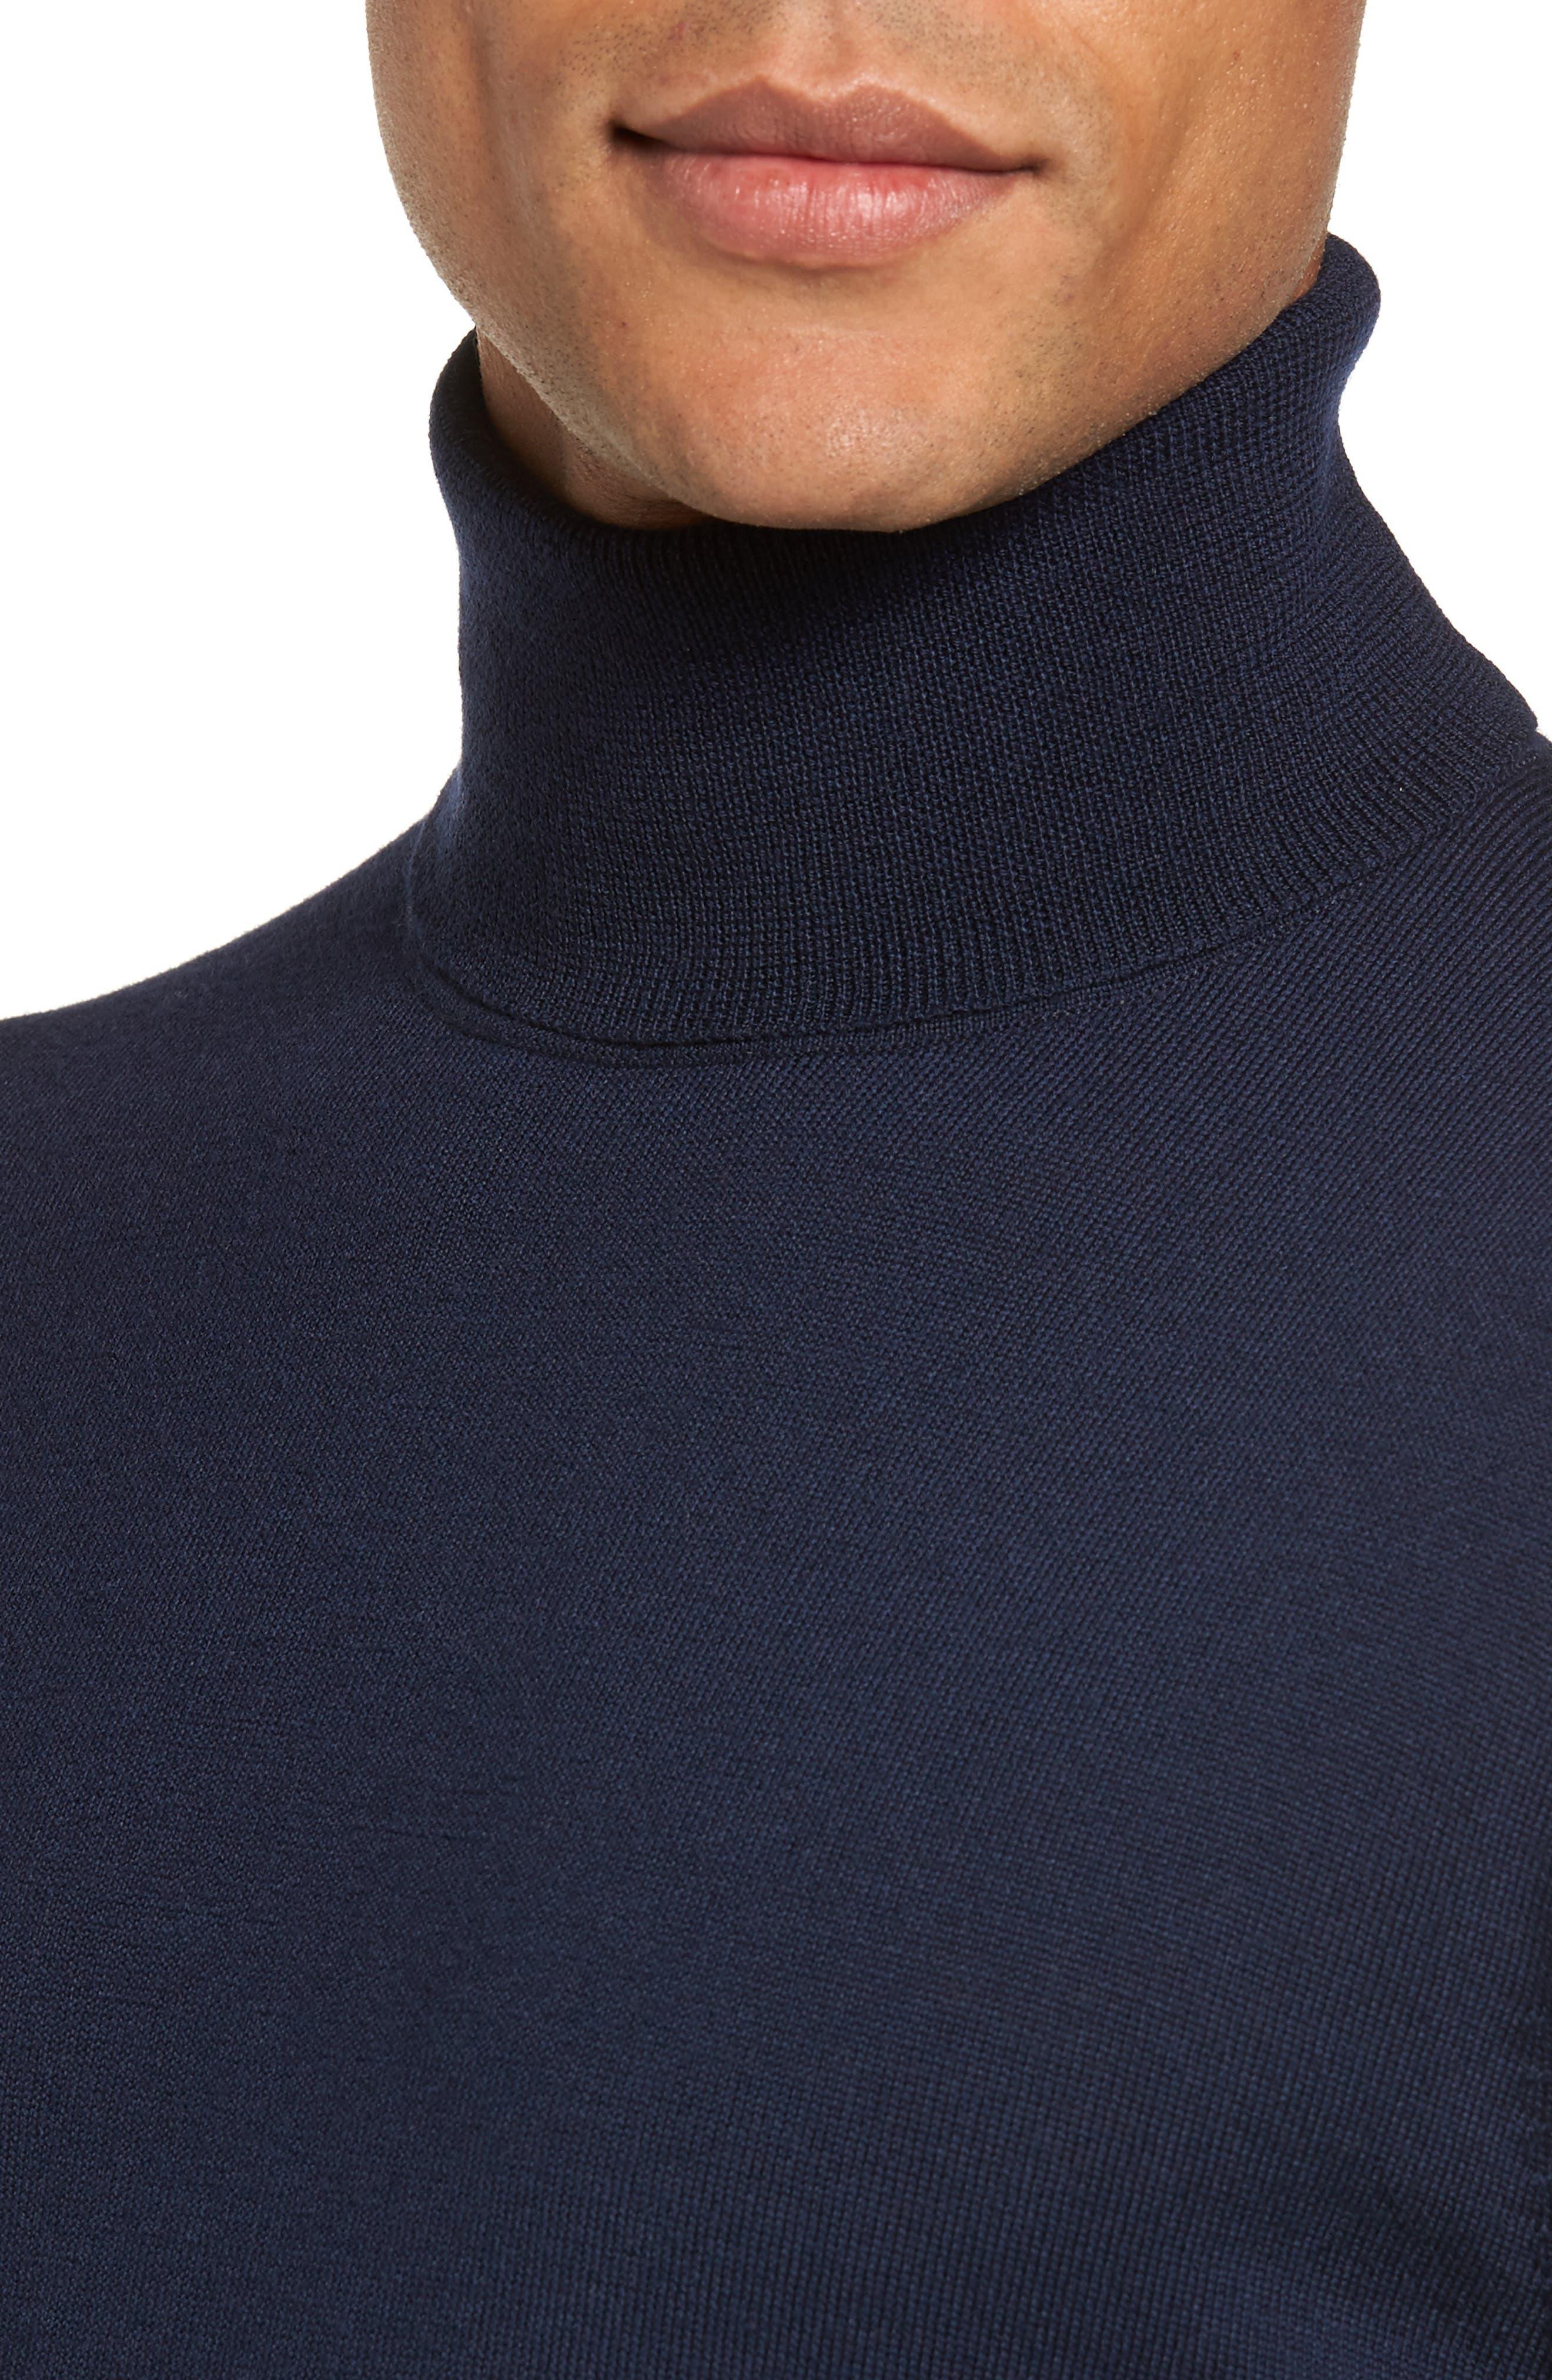 Merino Wool Turtleneck Sweater,                             Alternate thumbnail 23, color,